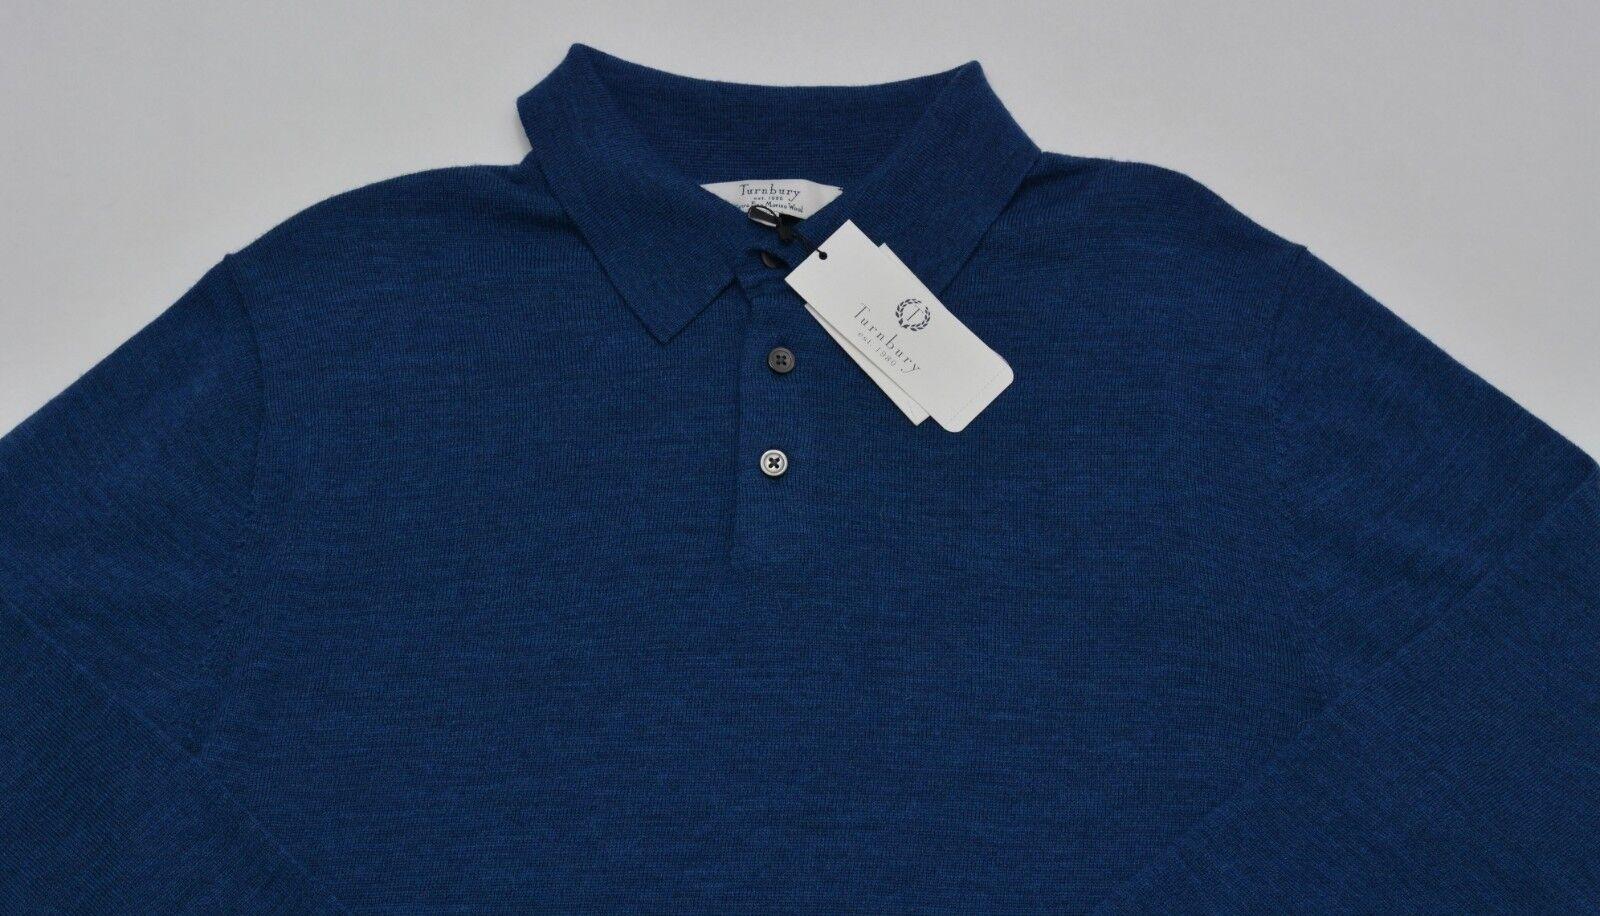 Men's TURNBURY Teal bluee Green Merino Wool Knit Shirt Sweater Small S NEW NWT